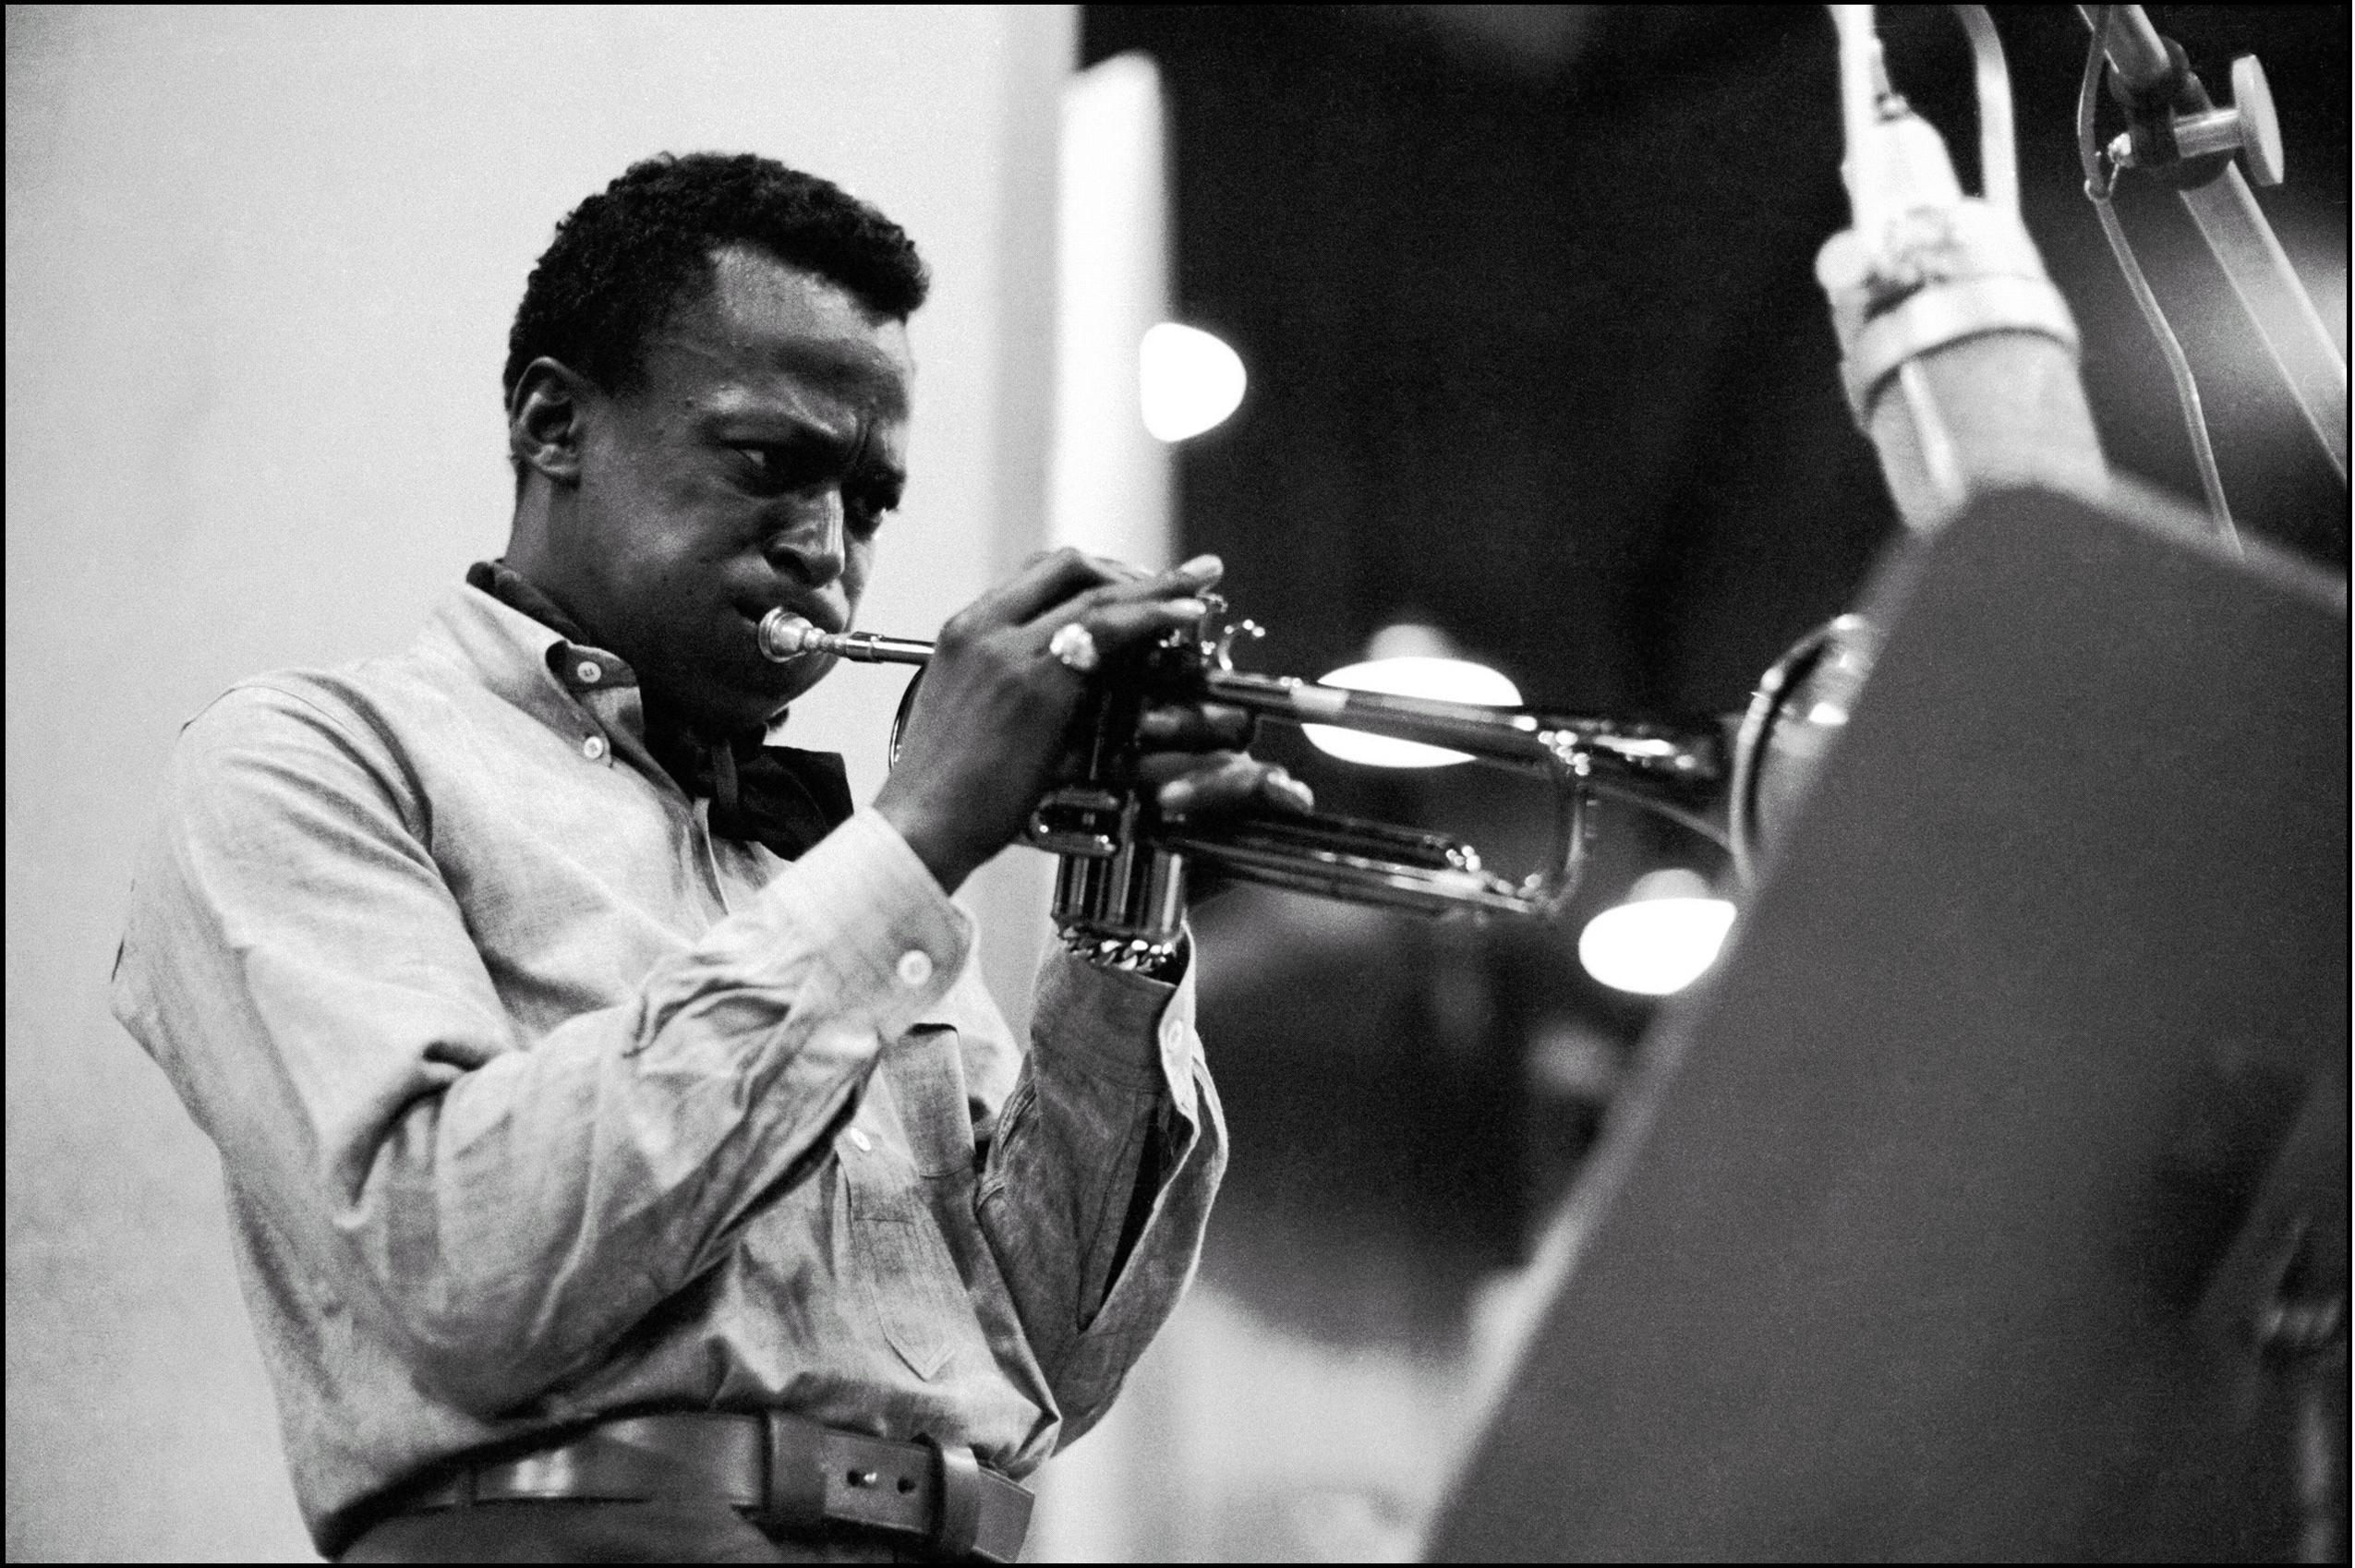 a biography of john william coltrane an american jazz musician